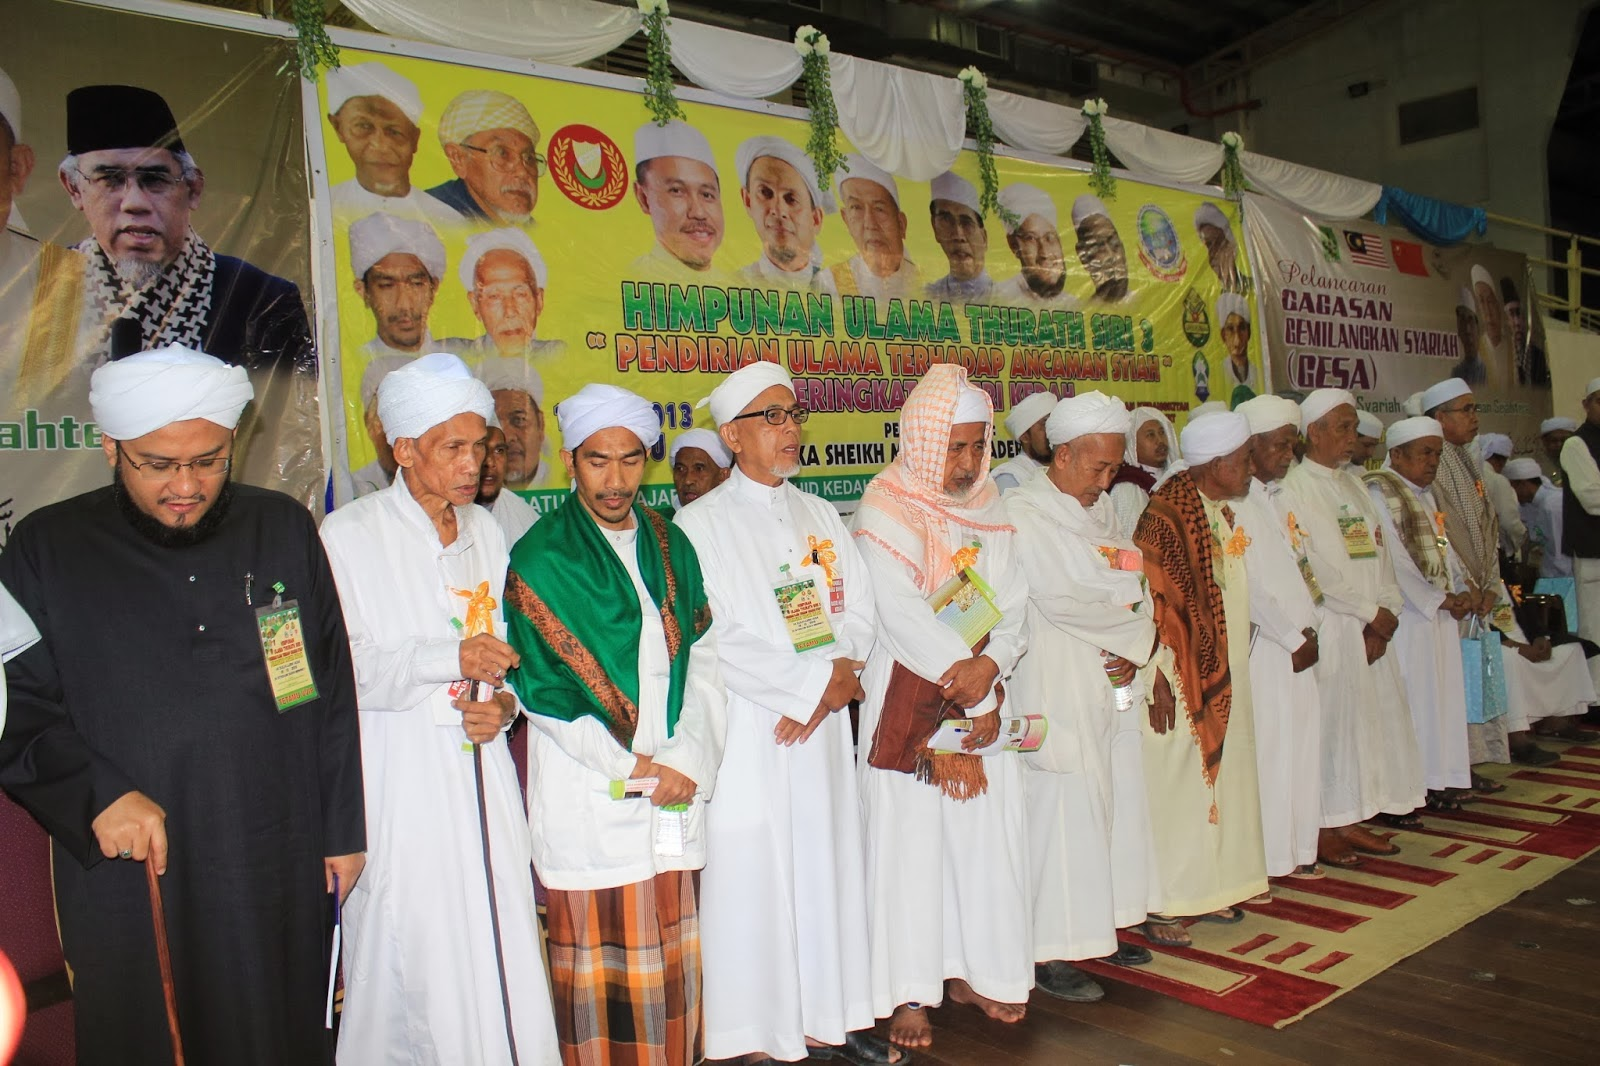 HIMPUNAN ULAMA THURATH SIRI 3